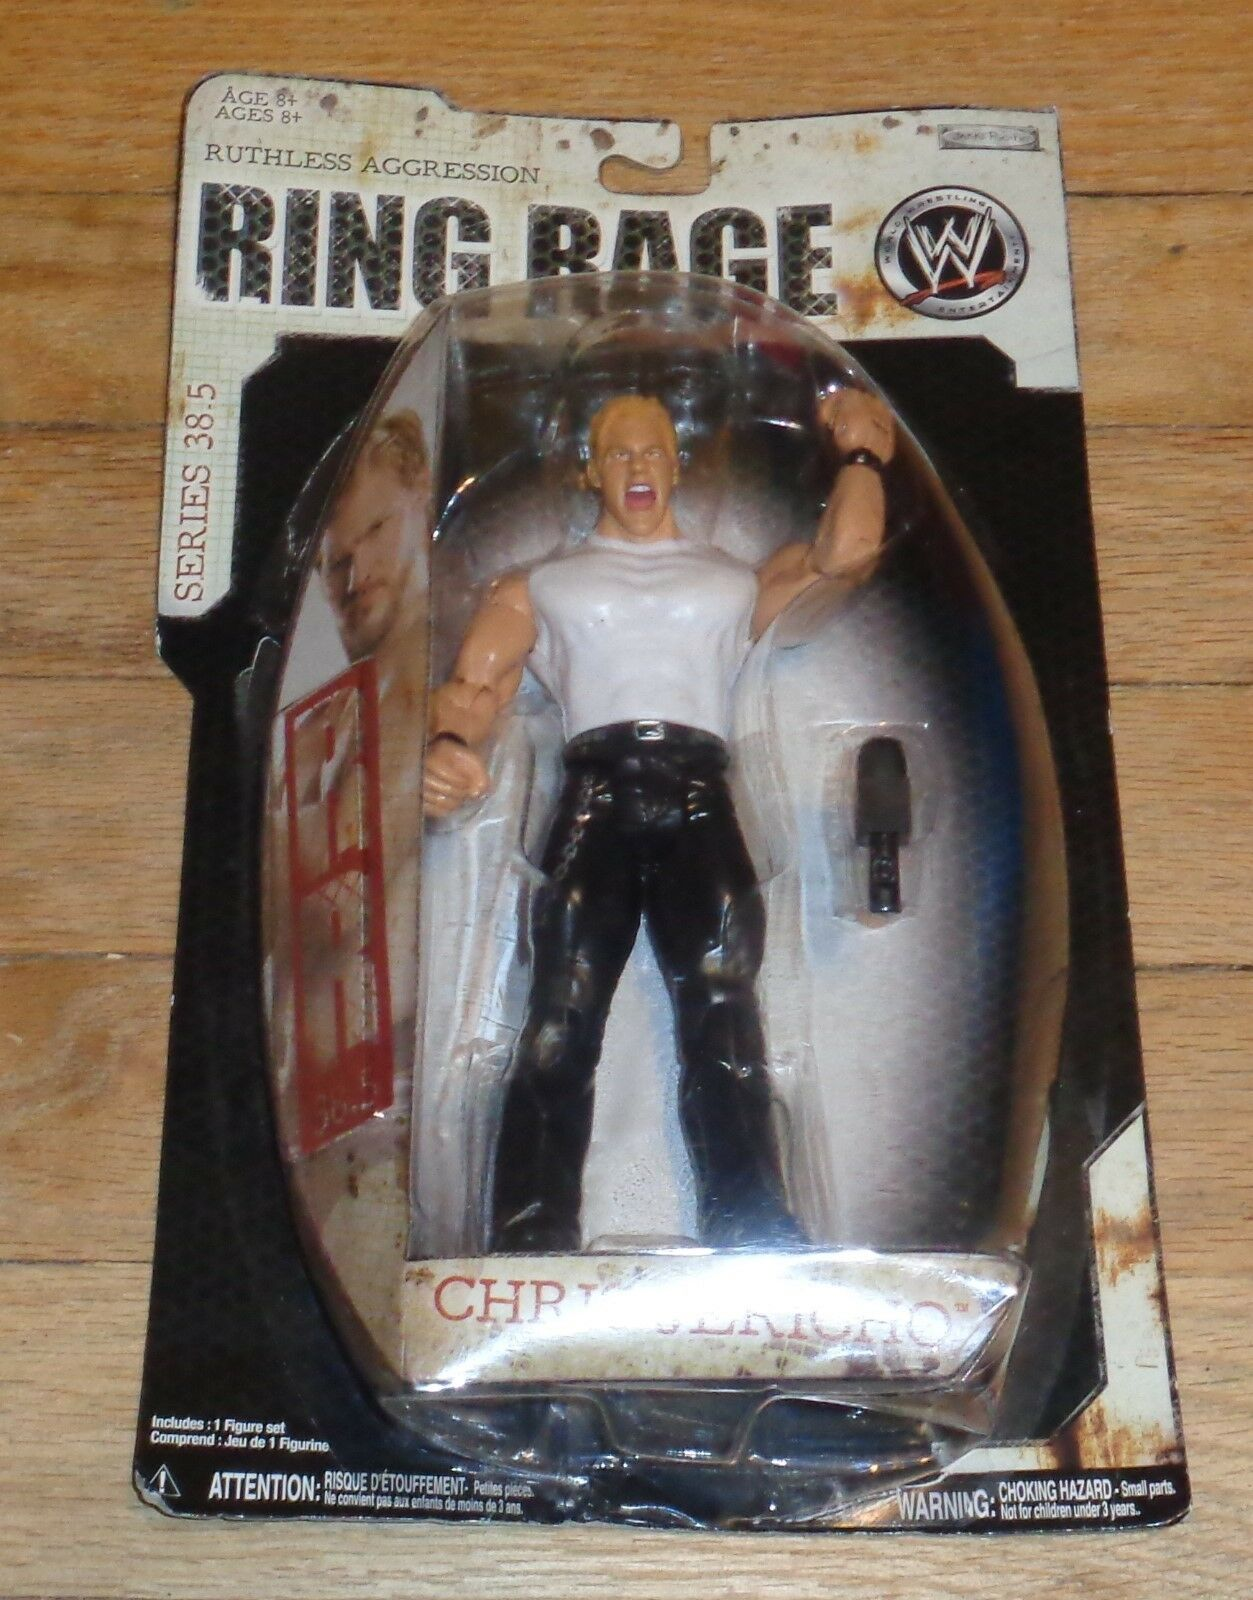 2009 WWF WWE Ring Jakks Chris Jericho Ring WWE Rage Wrestling Figure MOC WCW NJPW 7a1bea